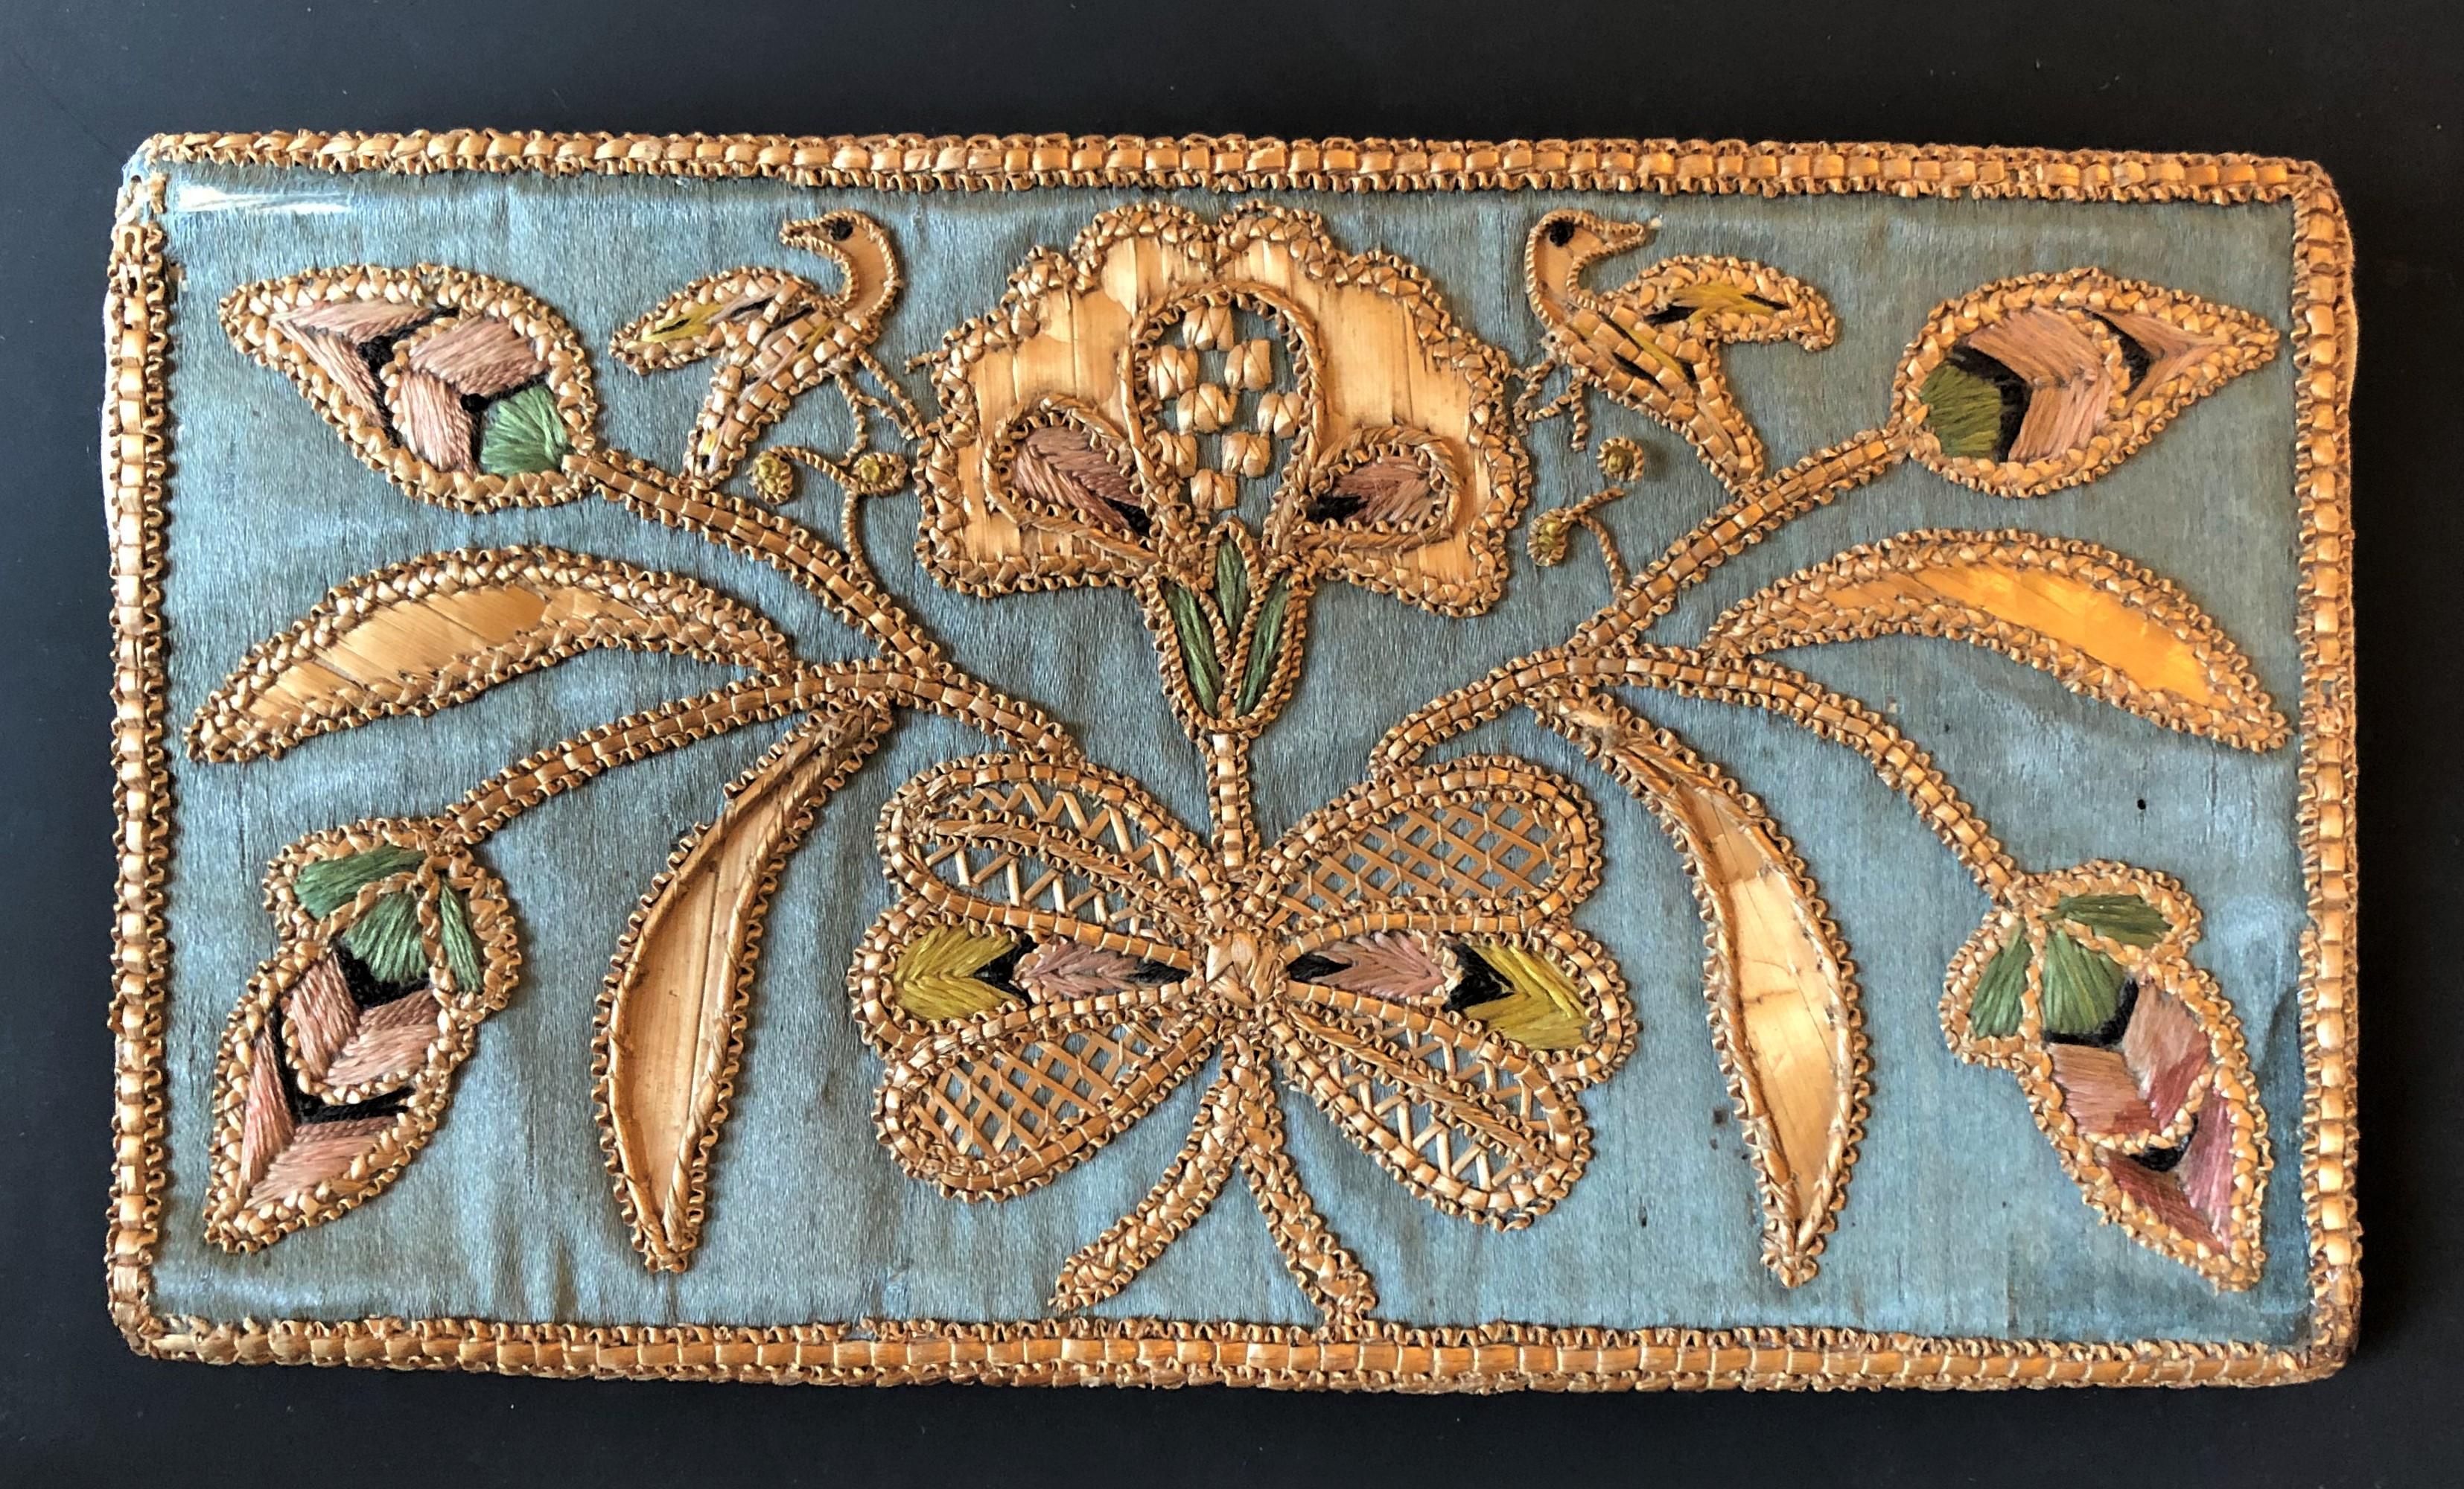 Antique Pocketbook, Musinsky Rare Books, Inc., straw embroidery, The Straw Shop